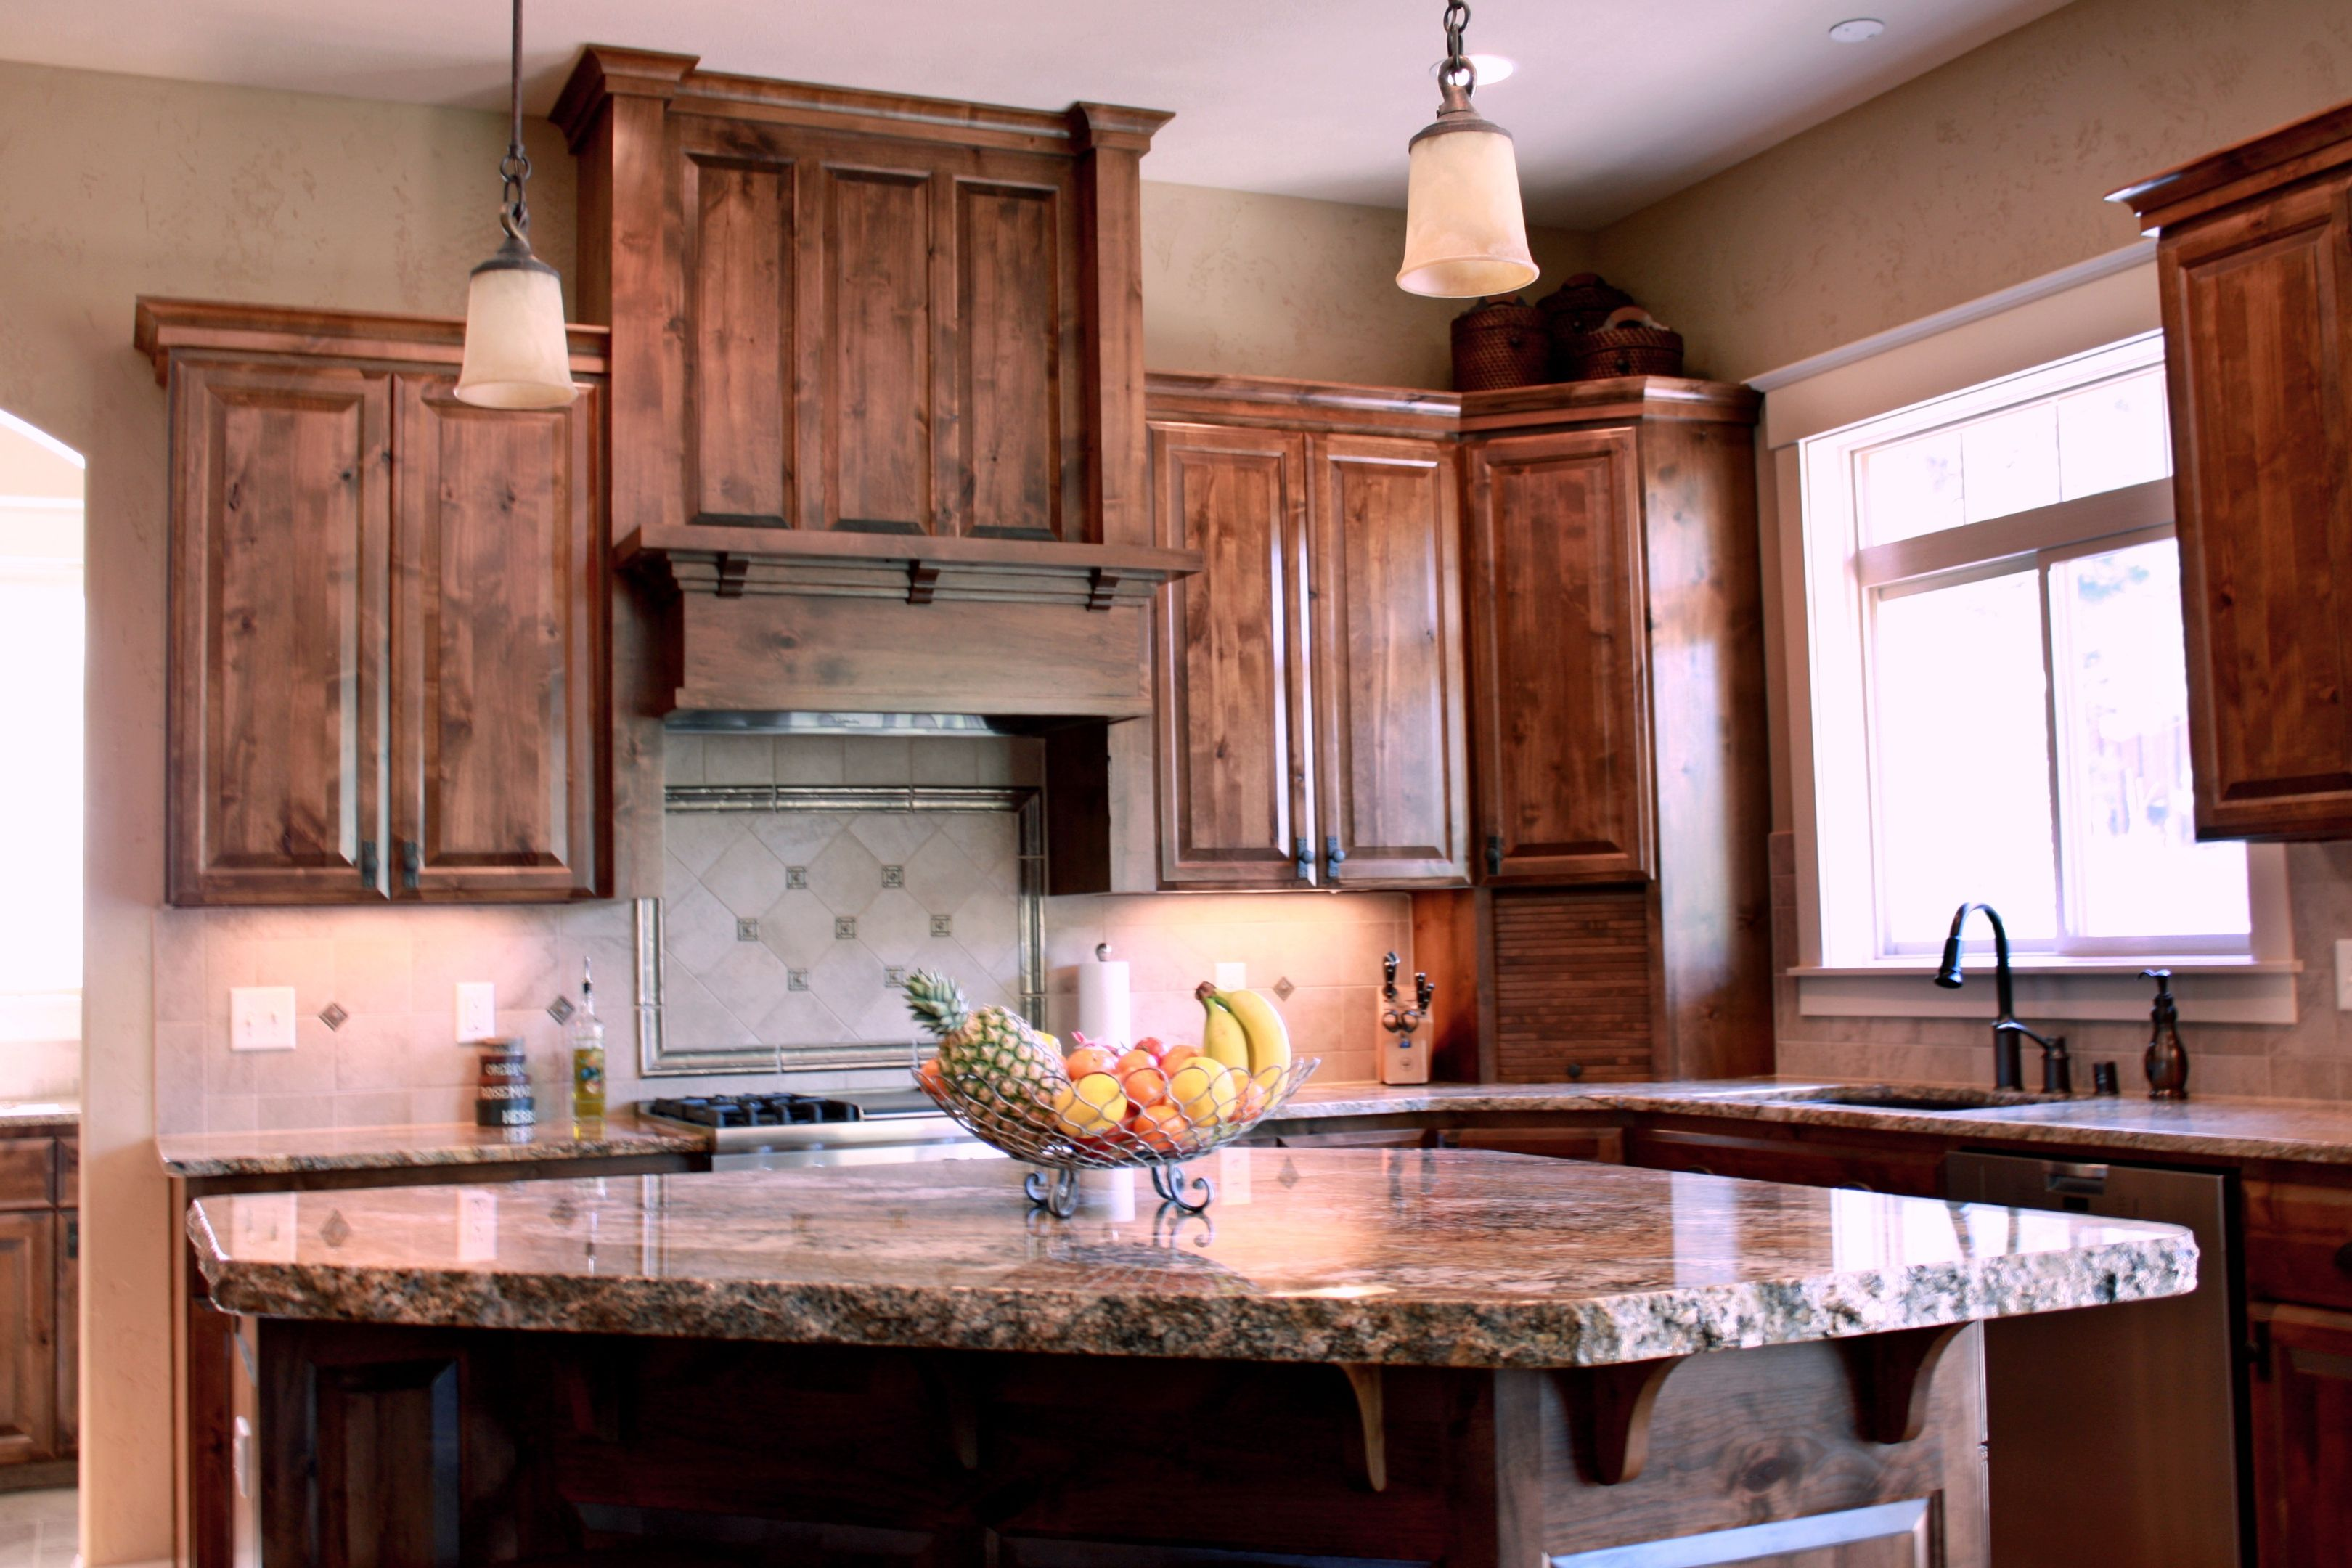 Next stop: Pinterest | Alder kitchen cabinets, Hickory ...